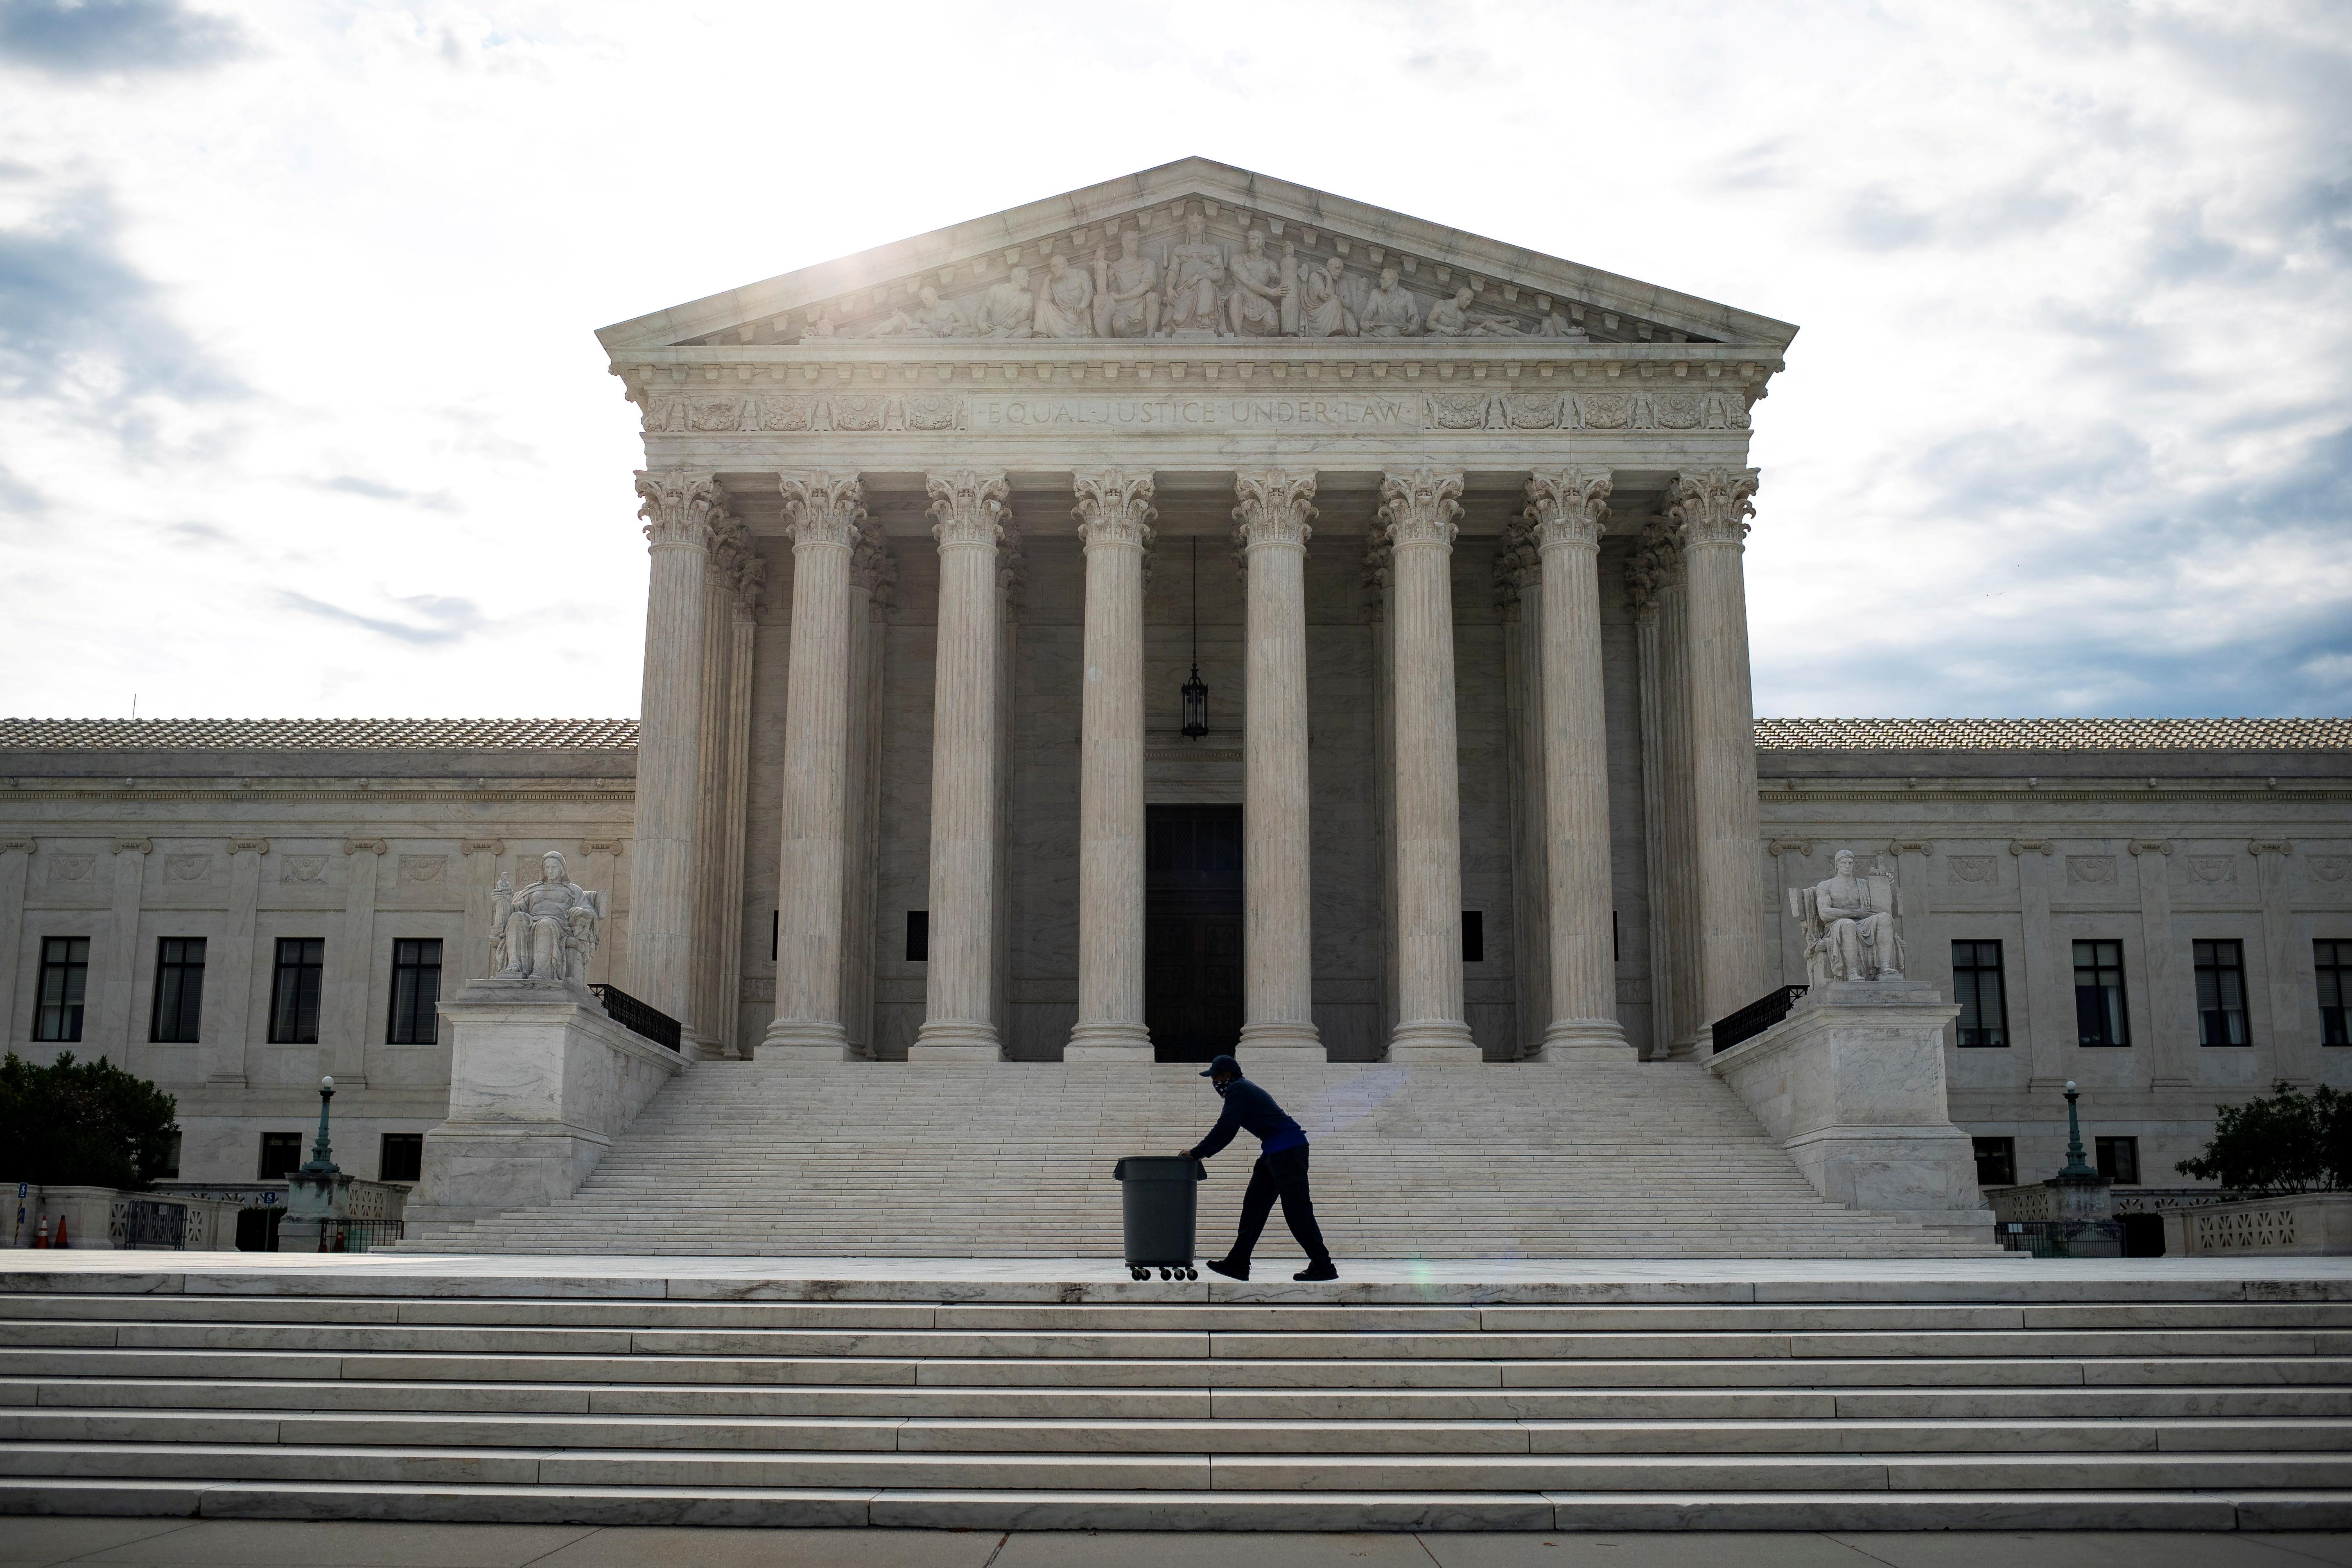 A man wheels a trash bins past the U.S. Supreme Court building in Washington, U.S., June 25, 2020. REUTERS/Al Drago/